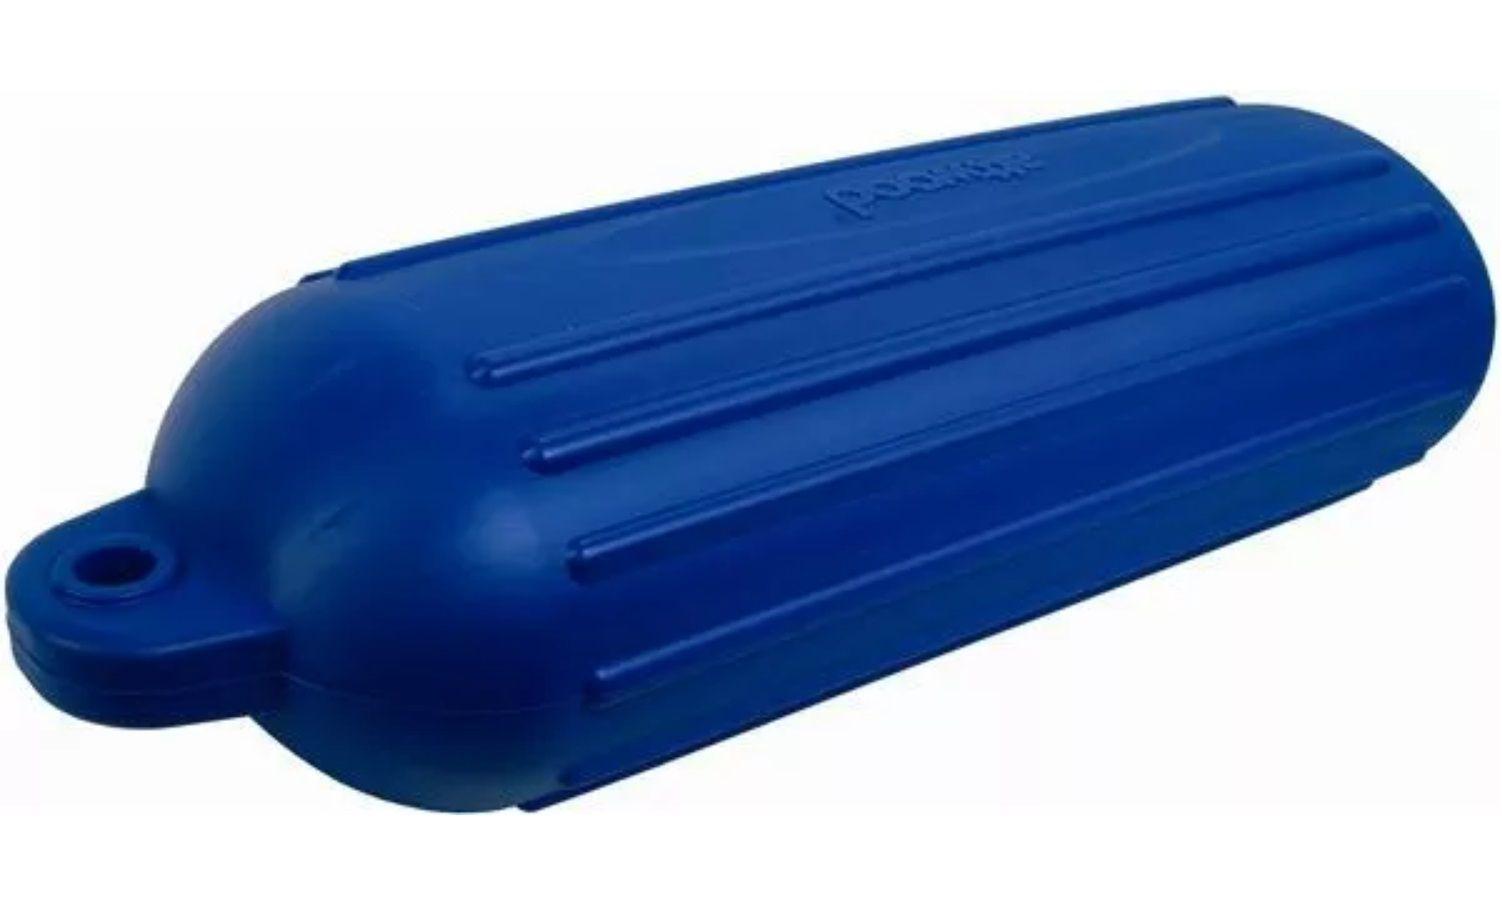 Defensa Náutica G5 Azul 20 X 71 cm Attwood para Barcos e Lanchas